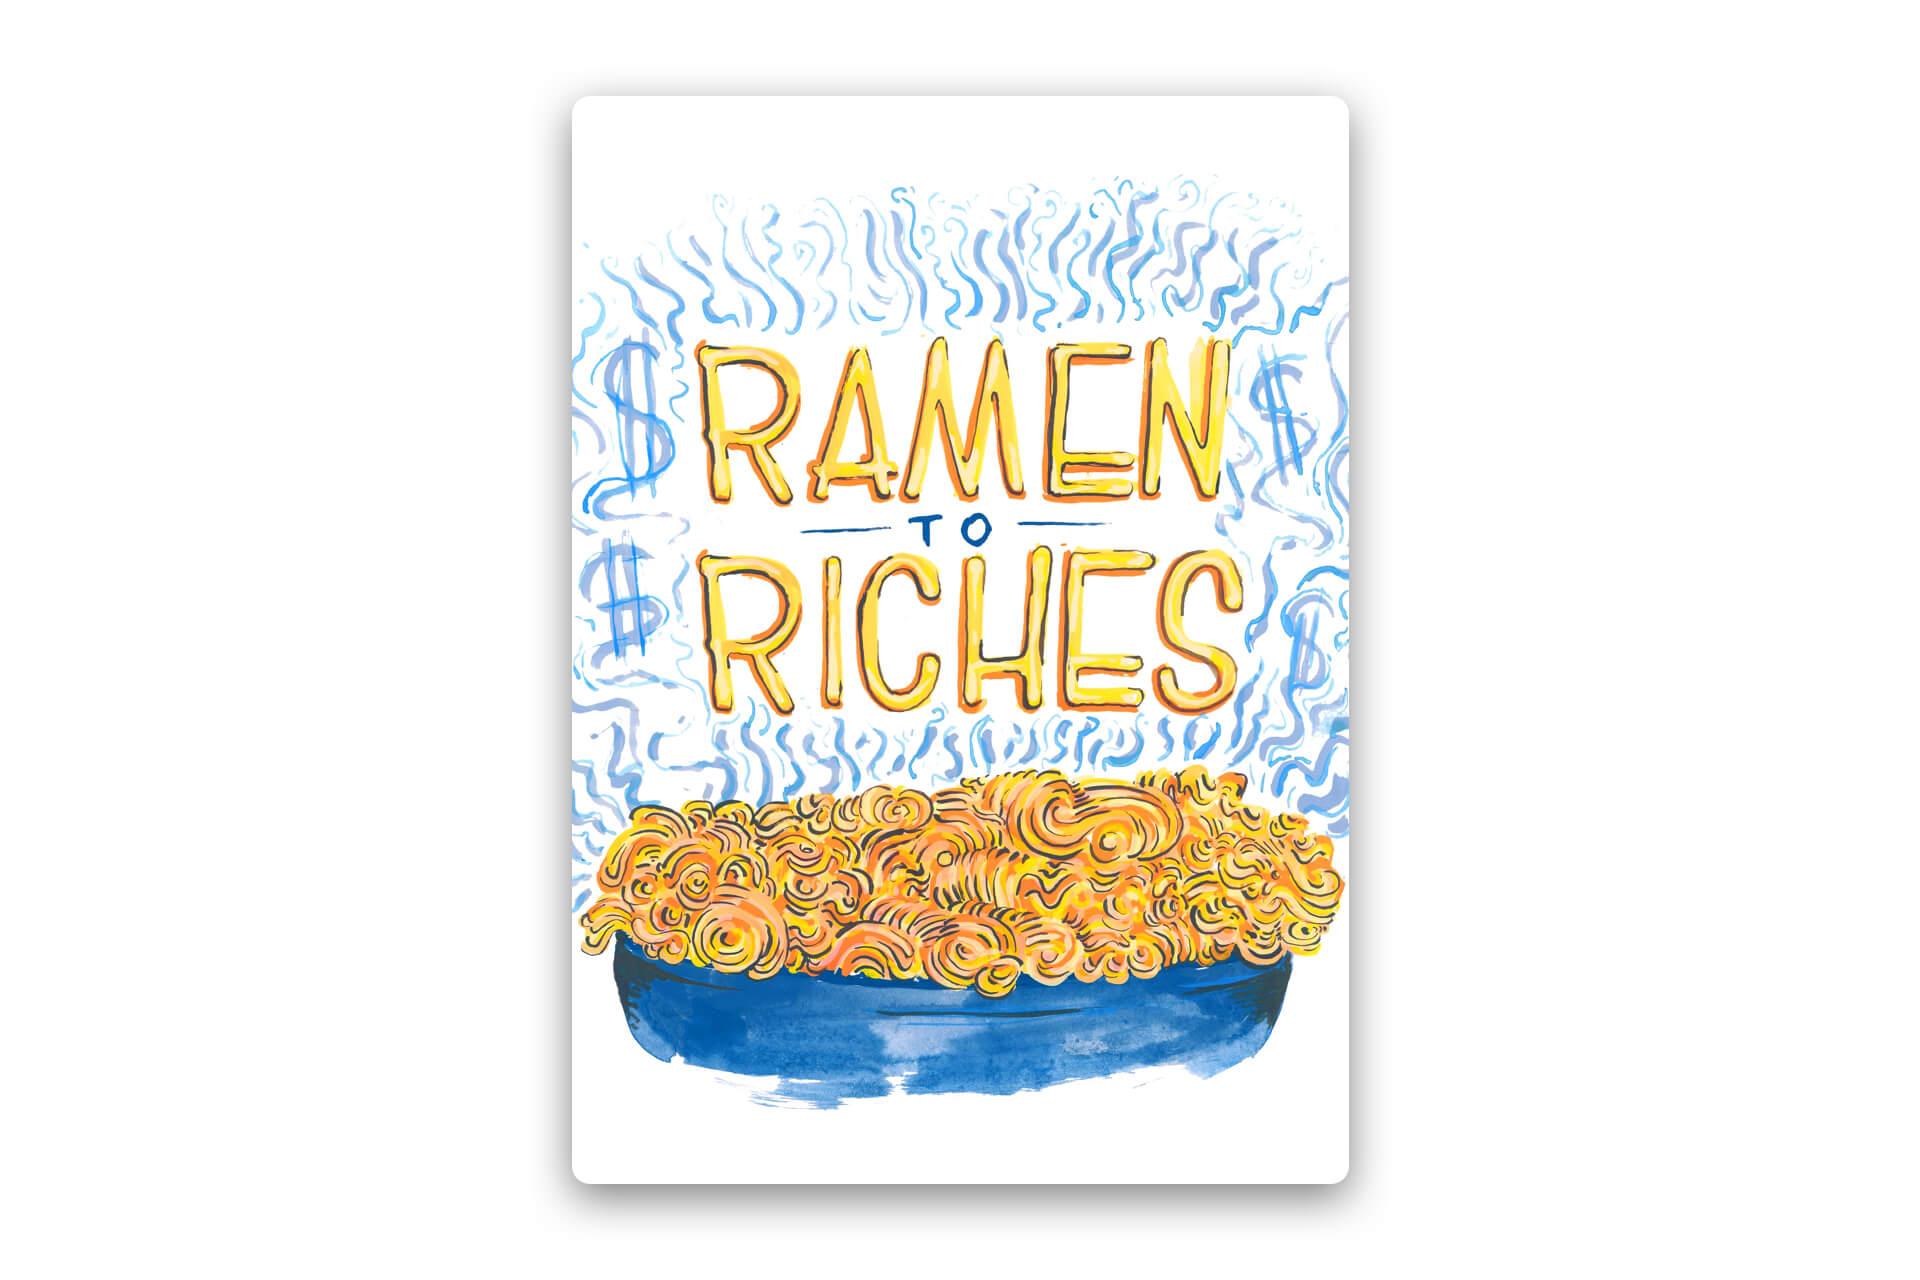 Ramen to Riches